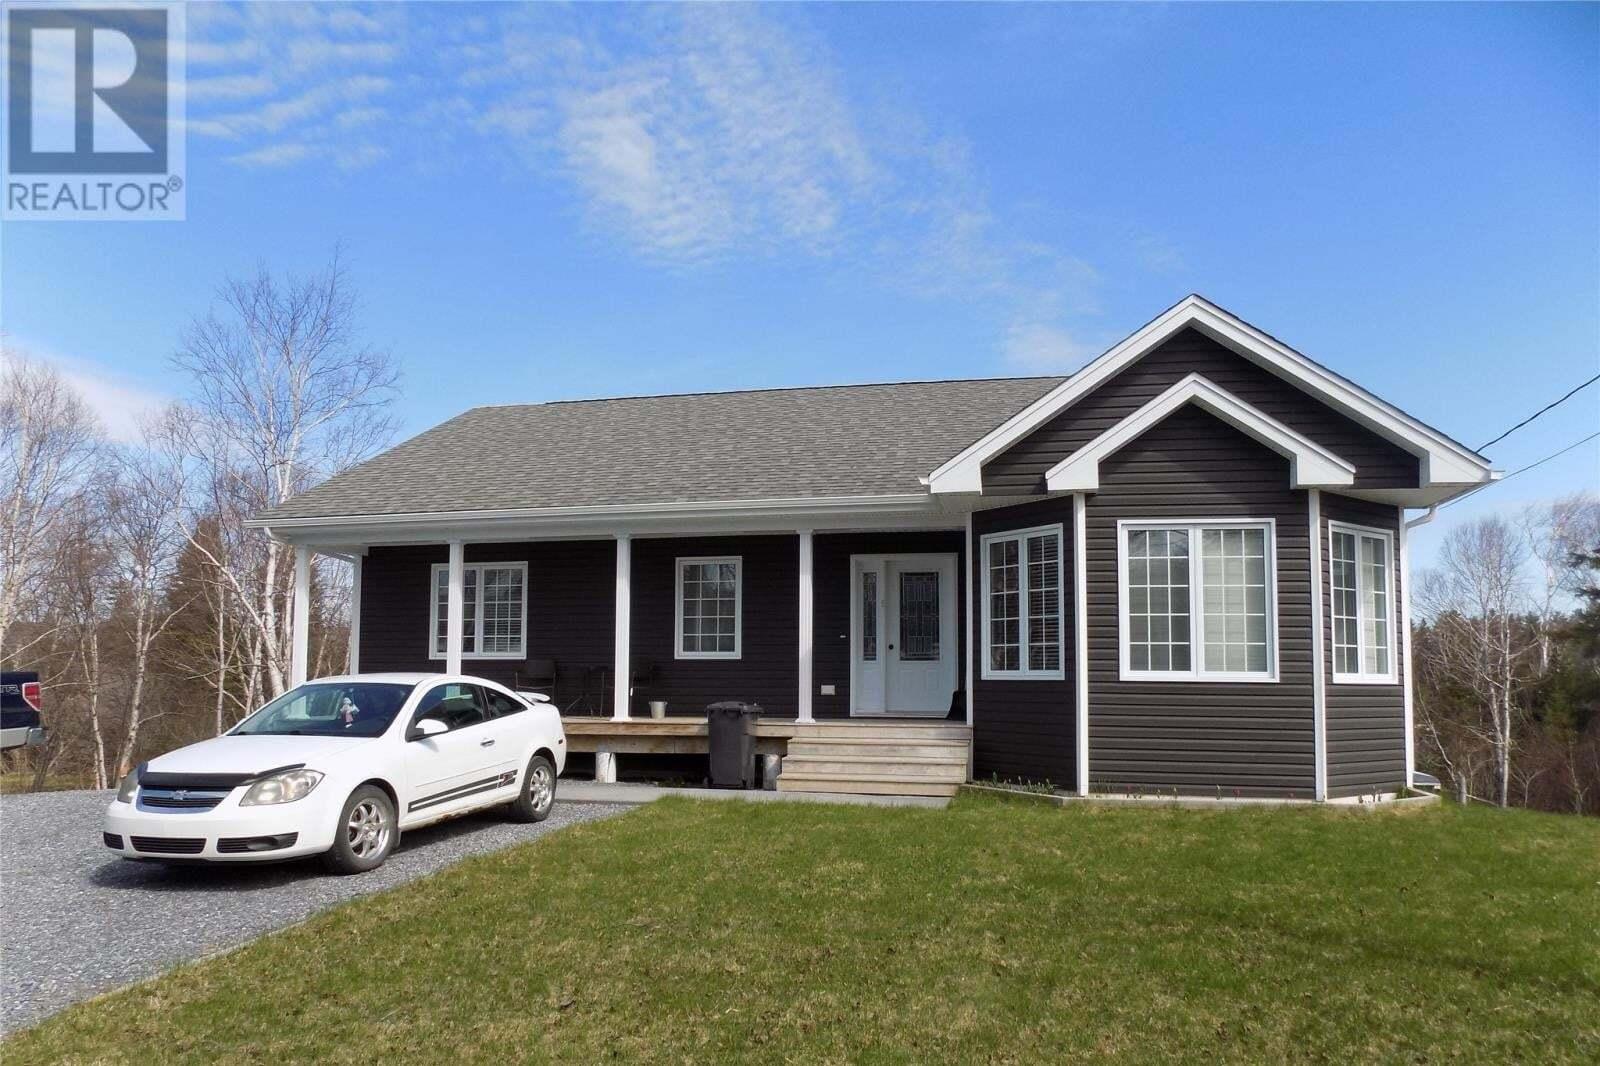 House for sale at 6 Berkshire Ave Pasadena Newfoundland - MLS: 1214053